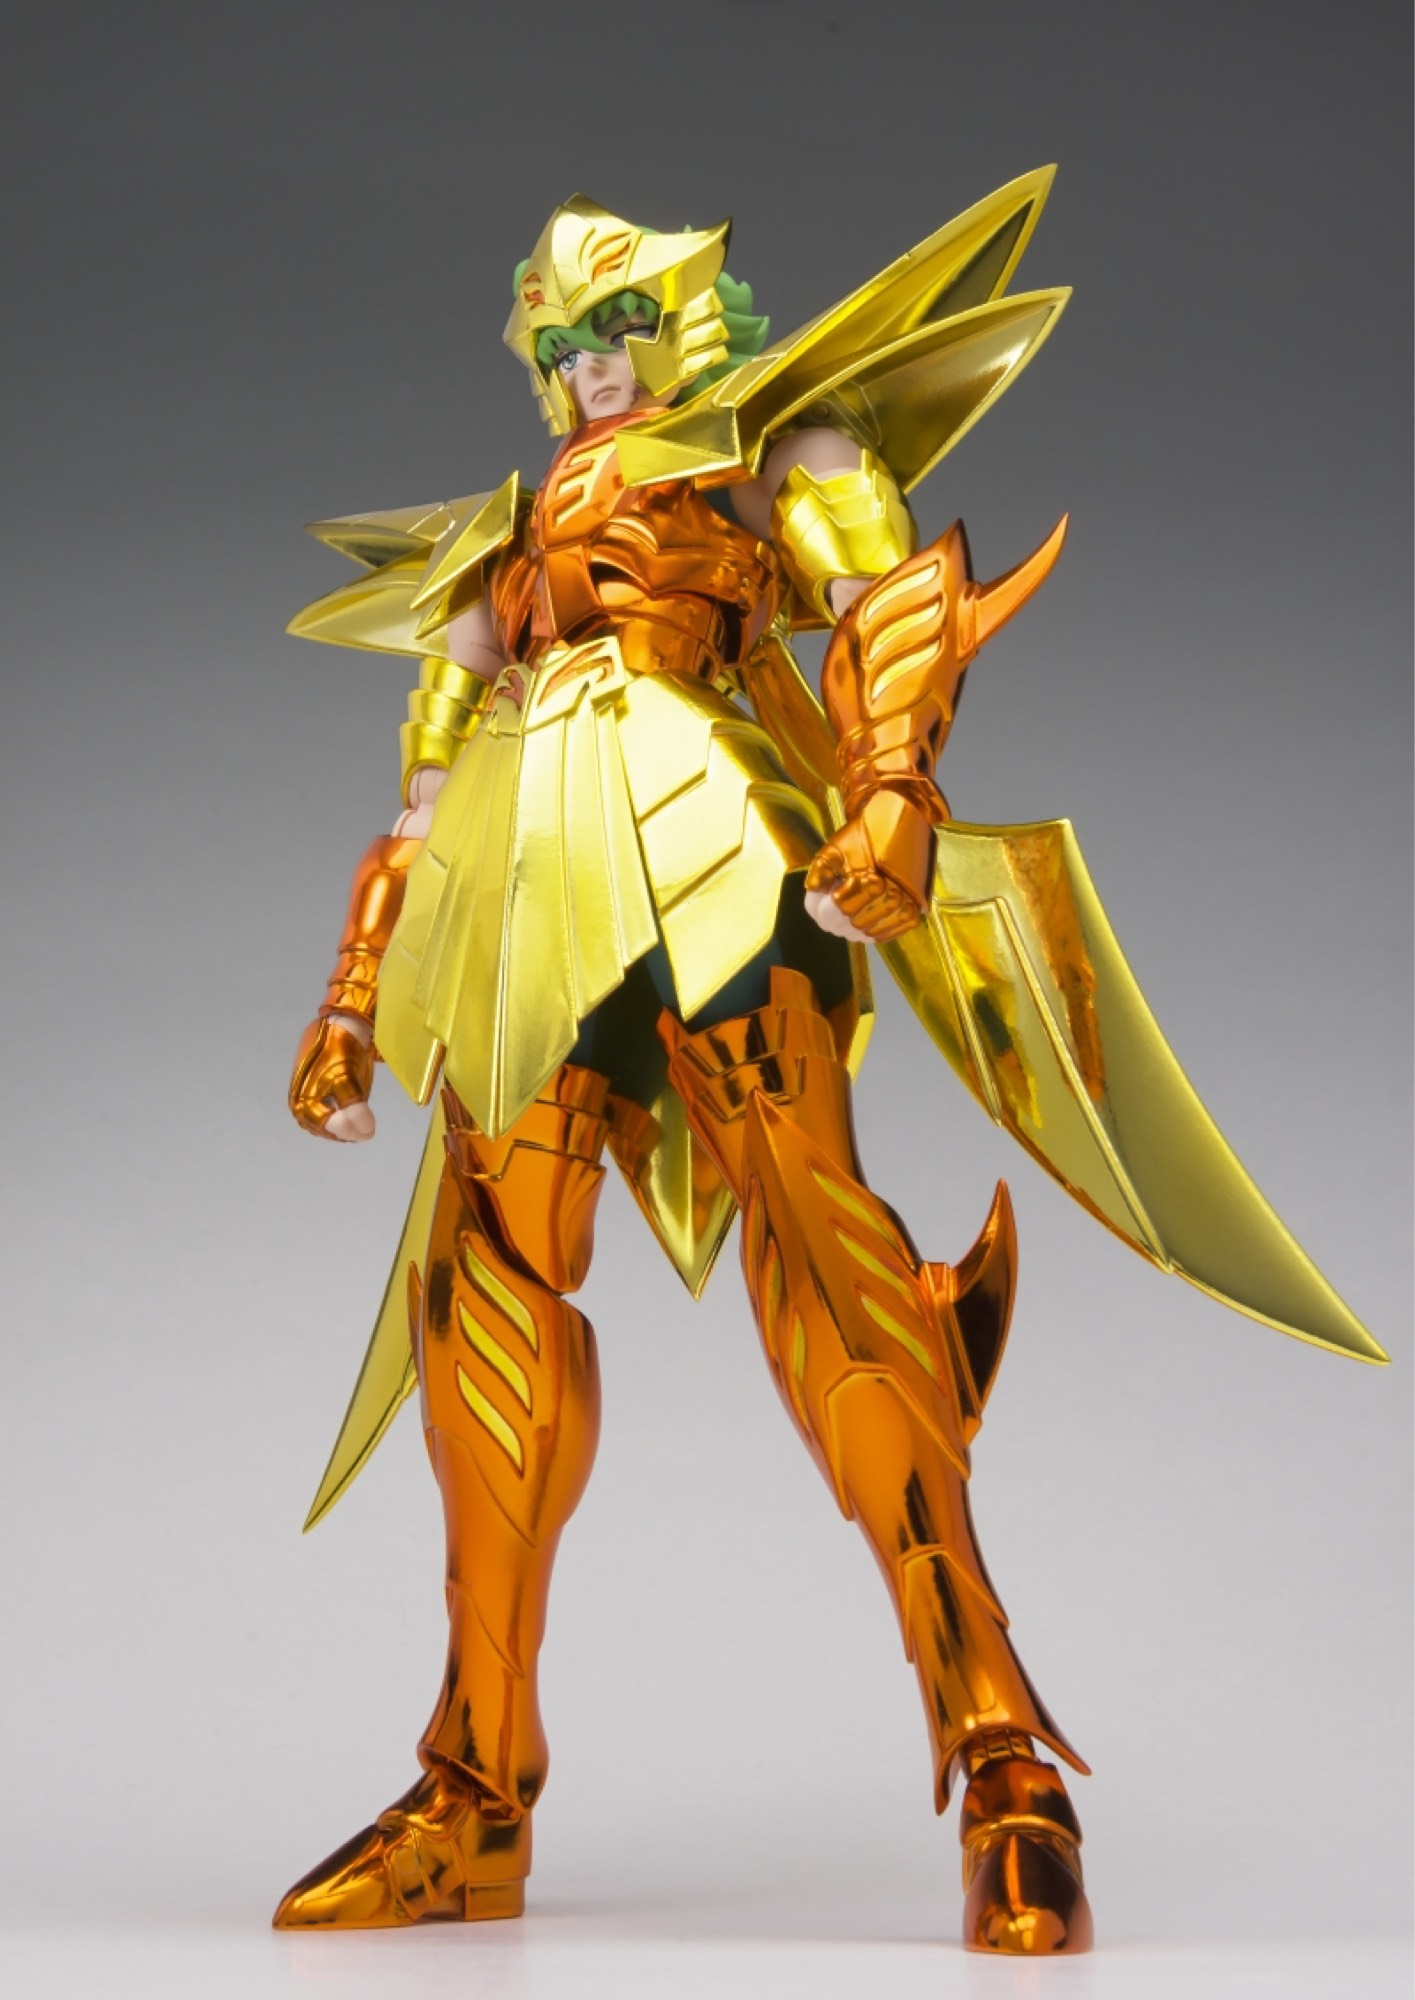 Figura Saint Seiya Myth Cloth EX Isaak Marina del Kraken 18 cm